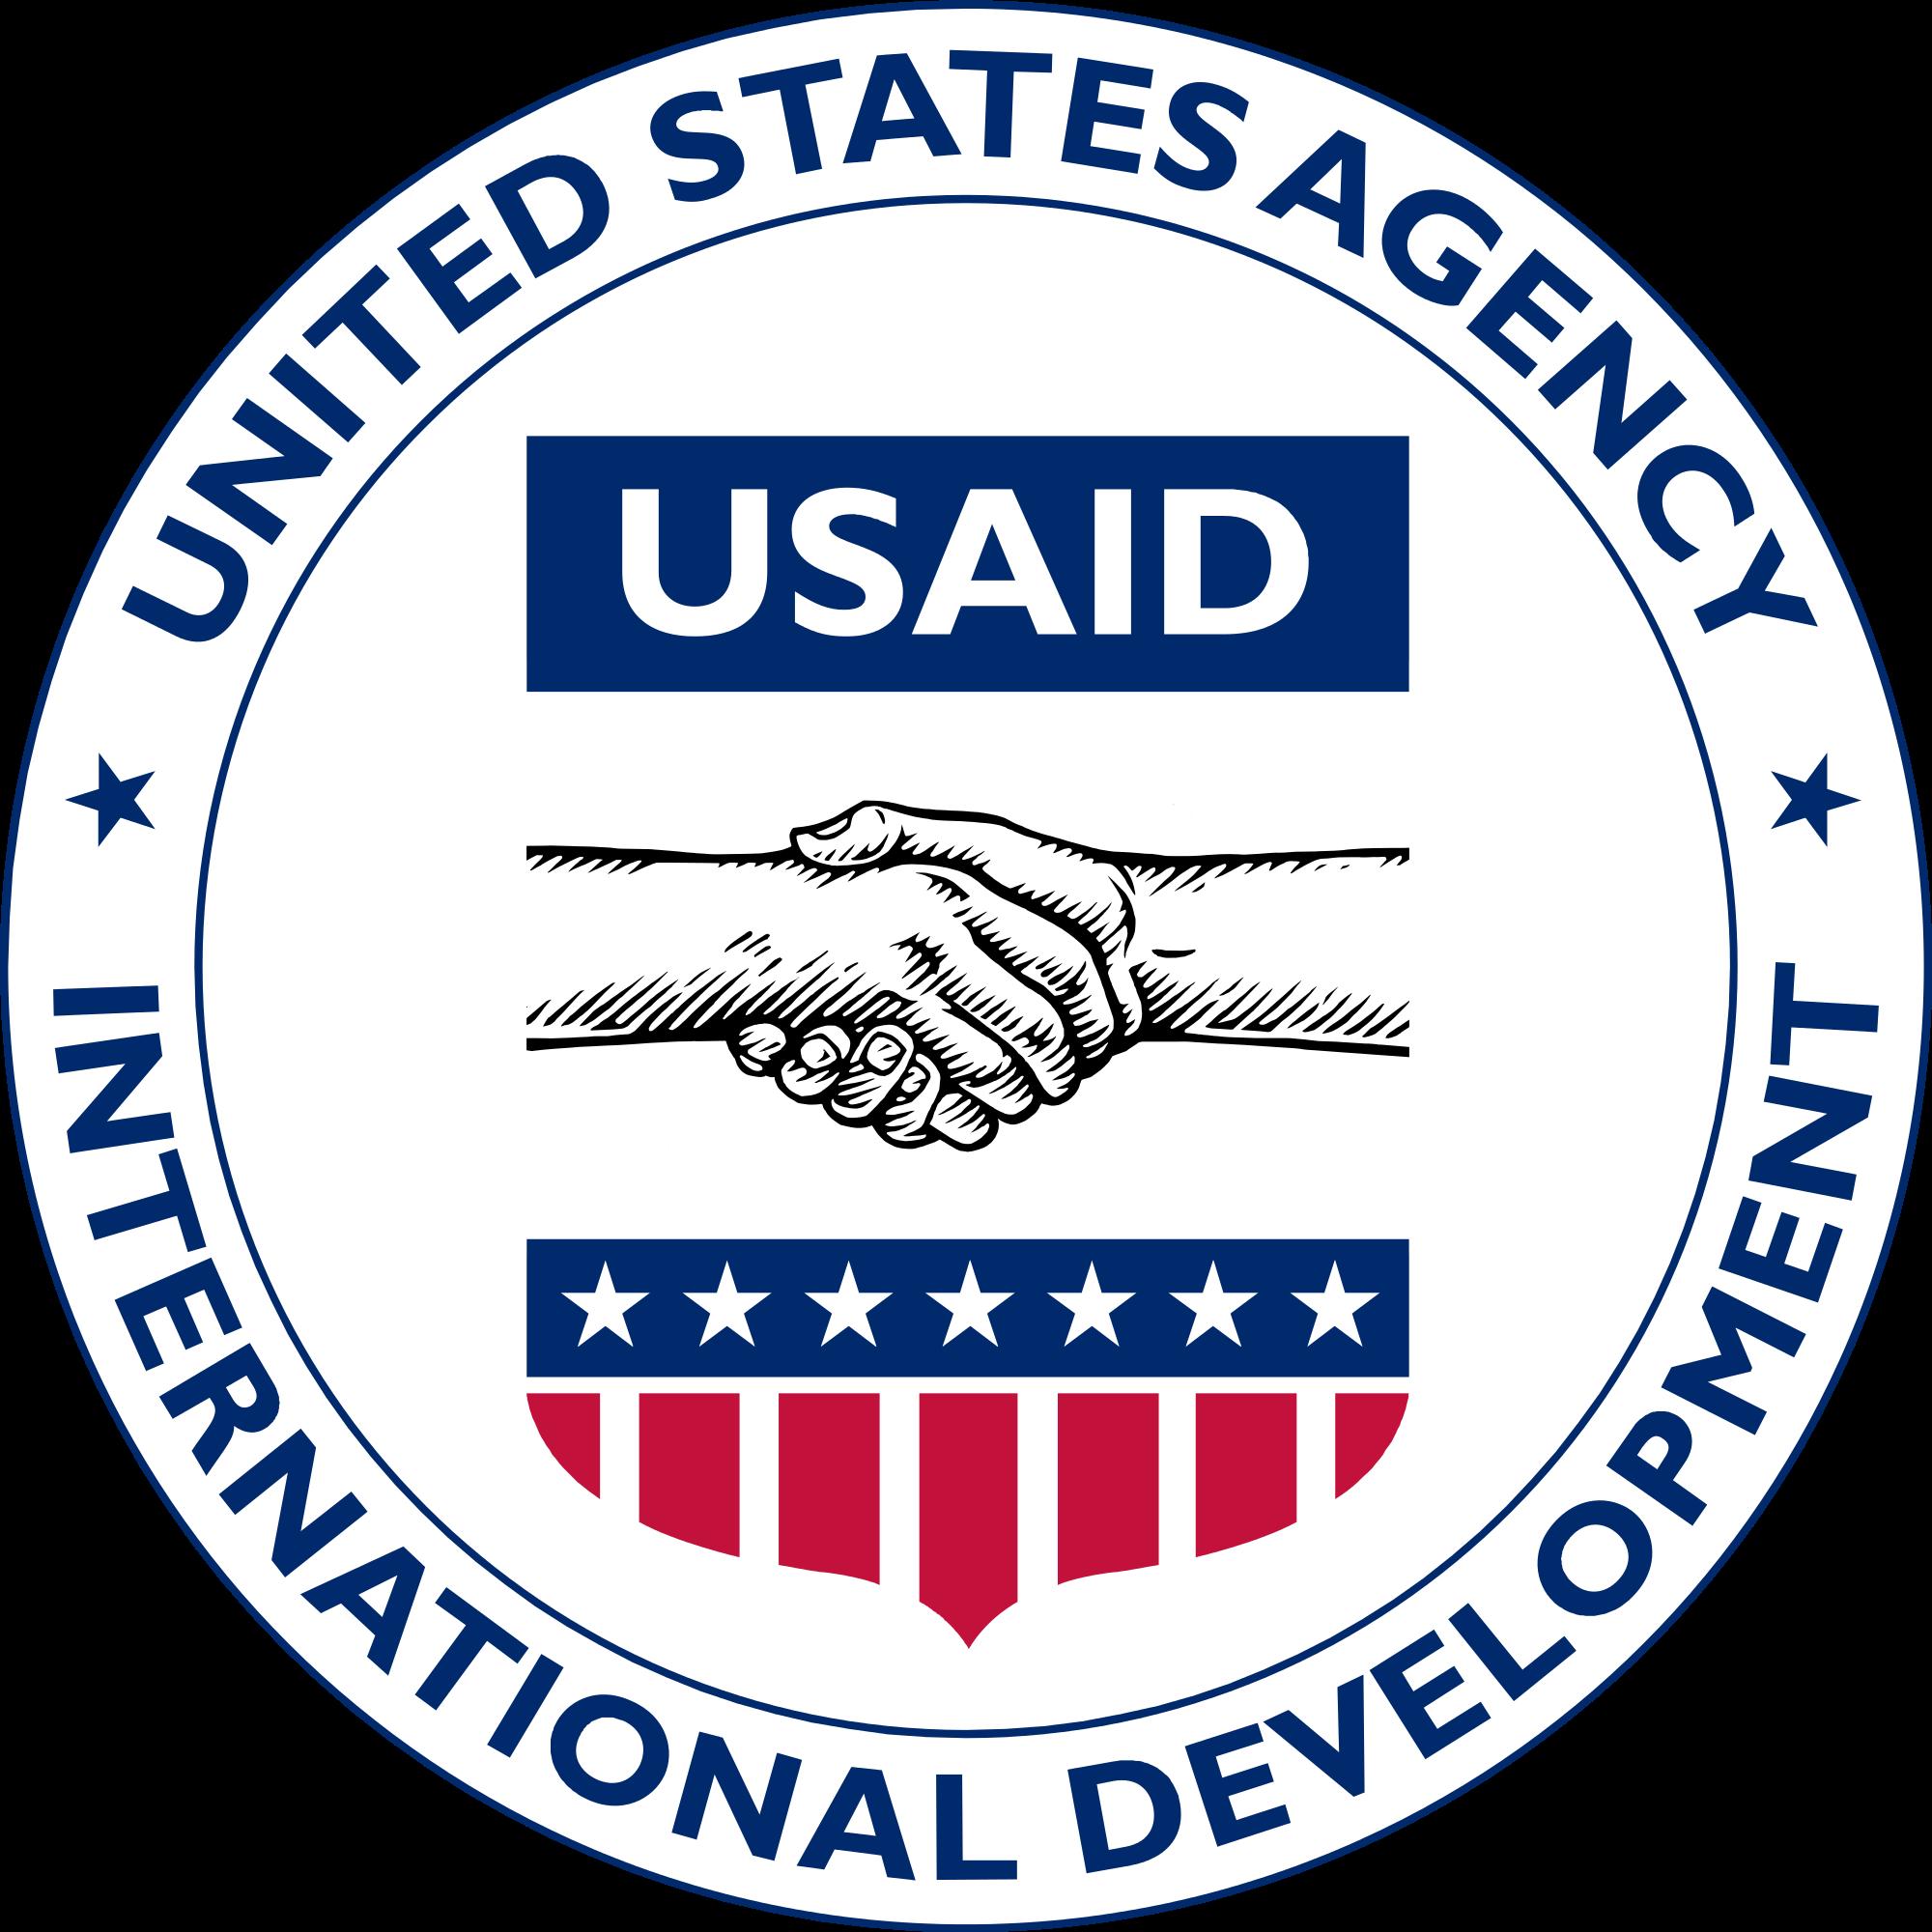 United States Agency for International Development agency seal